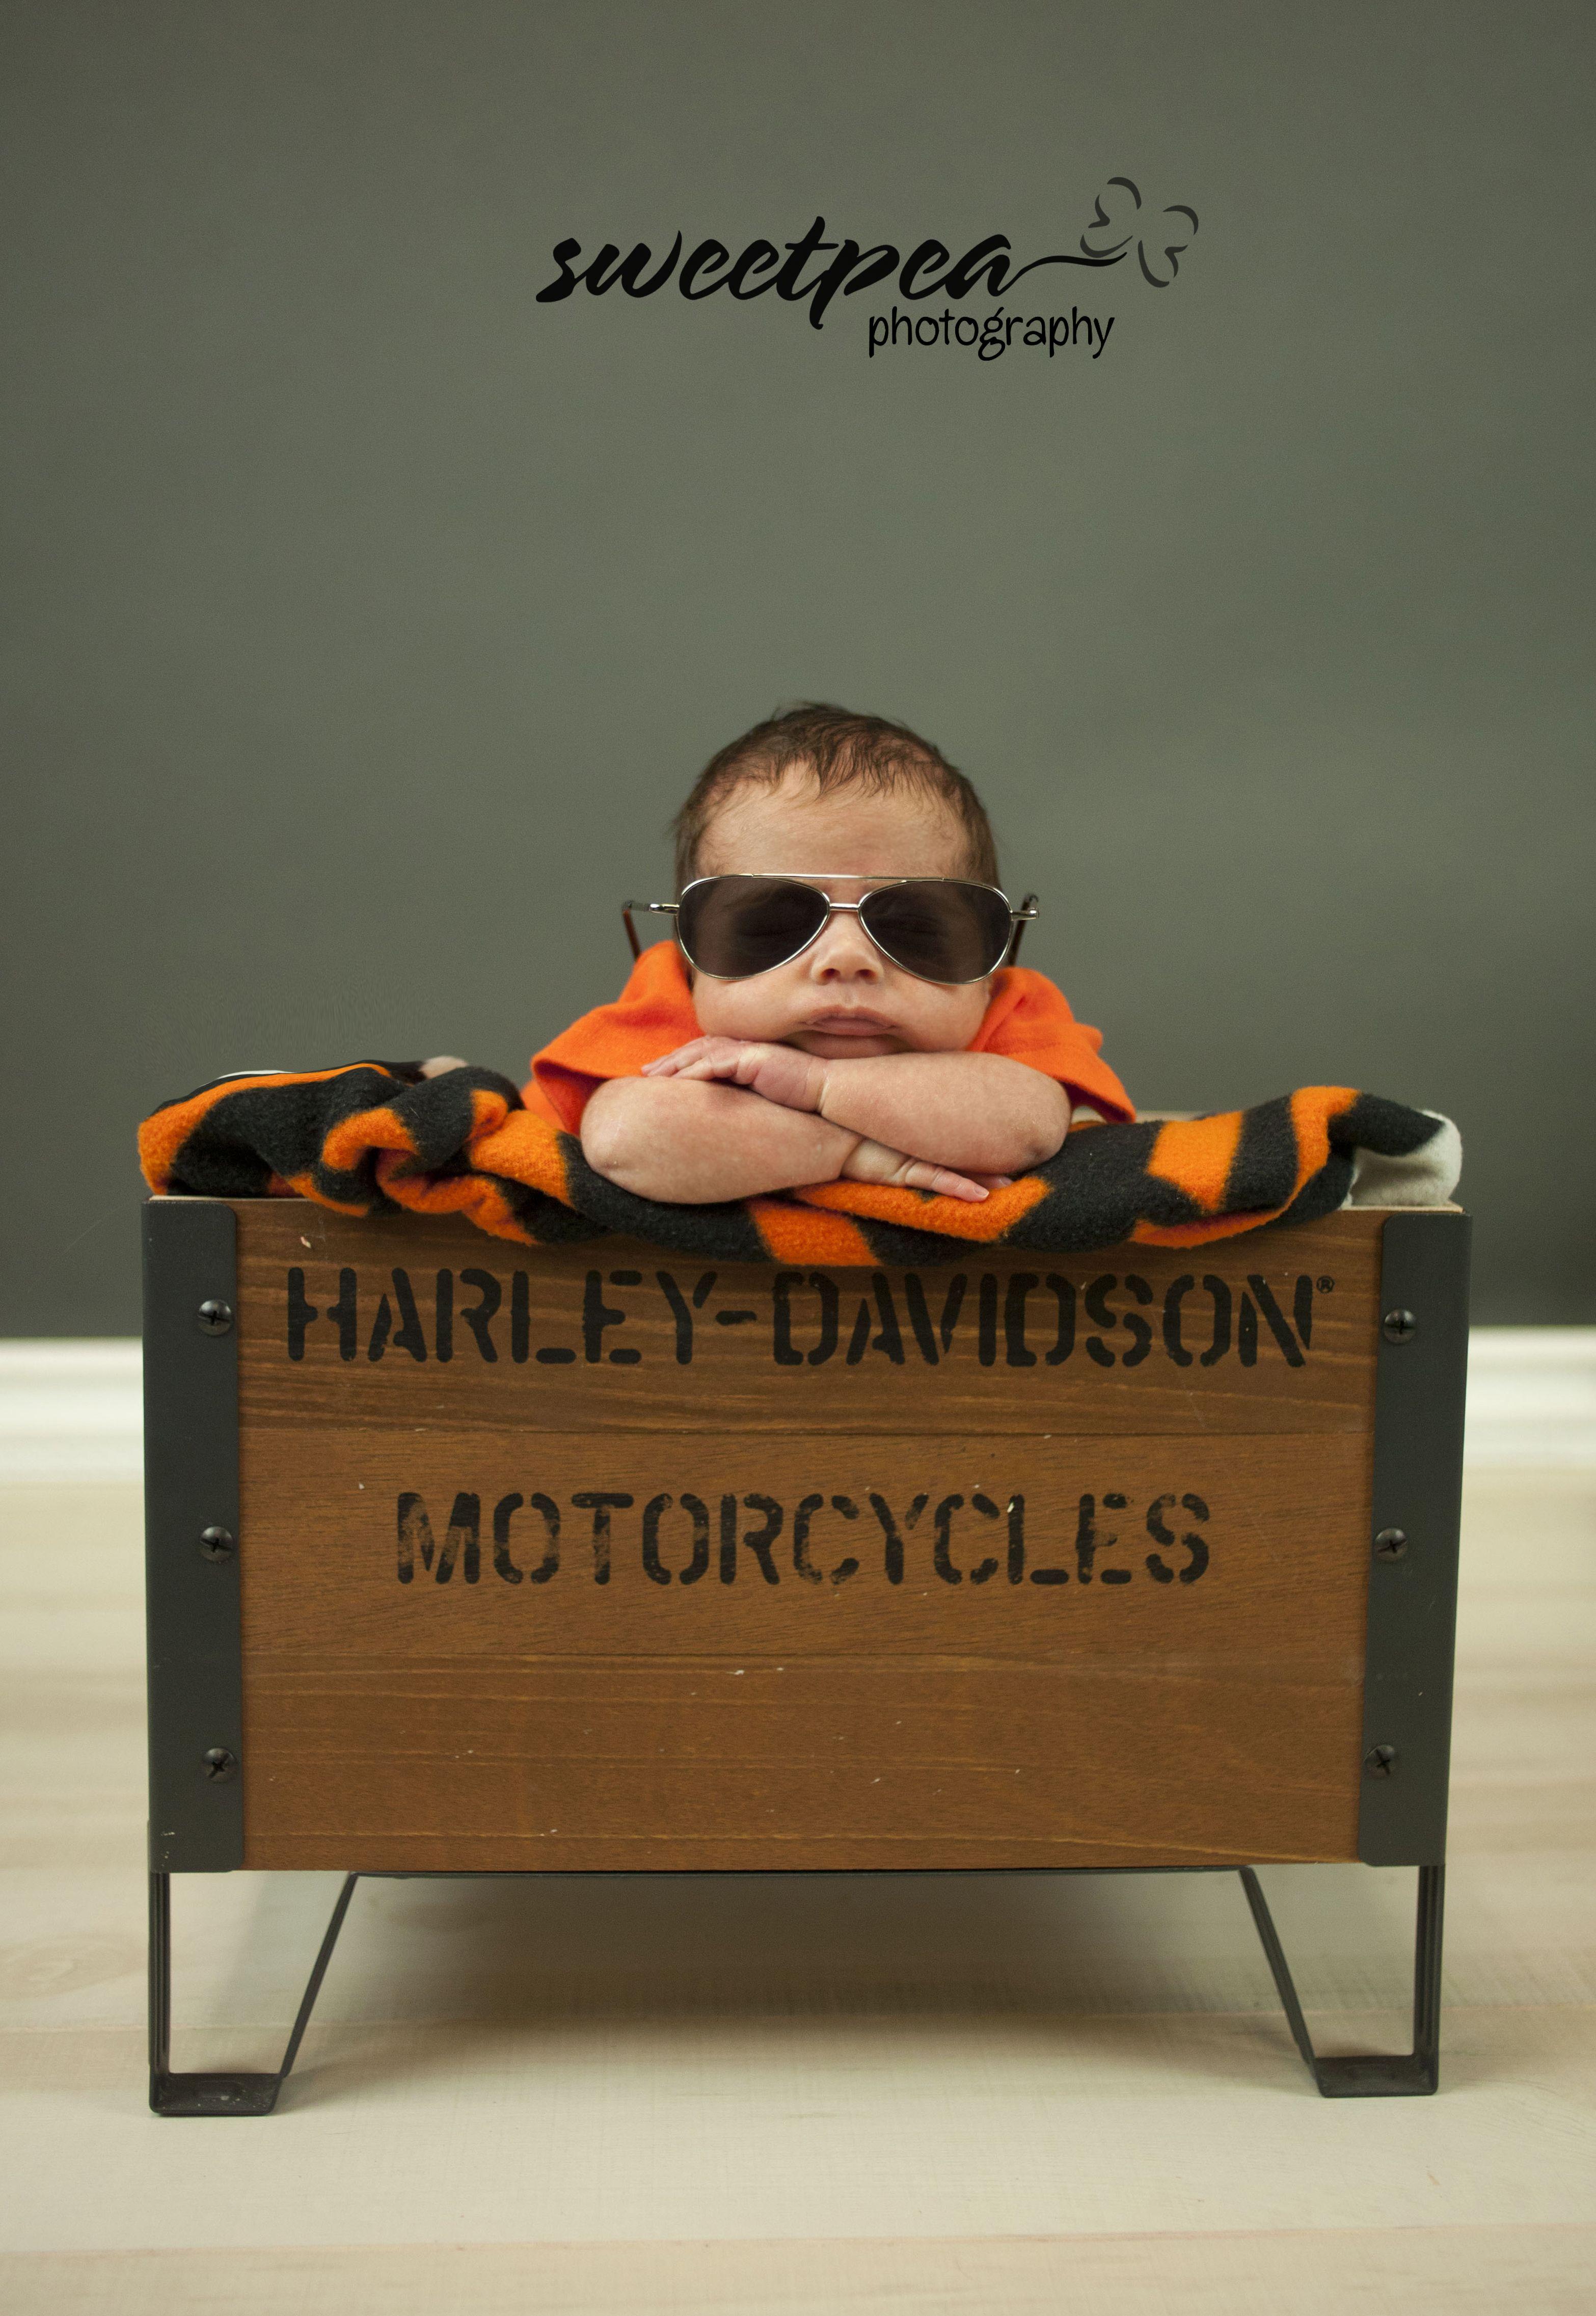 Harley Davidson newborn pose